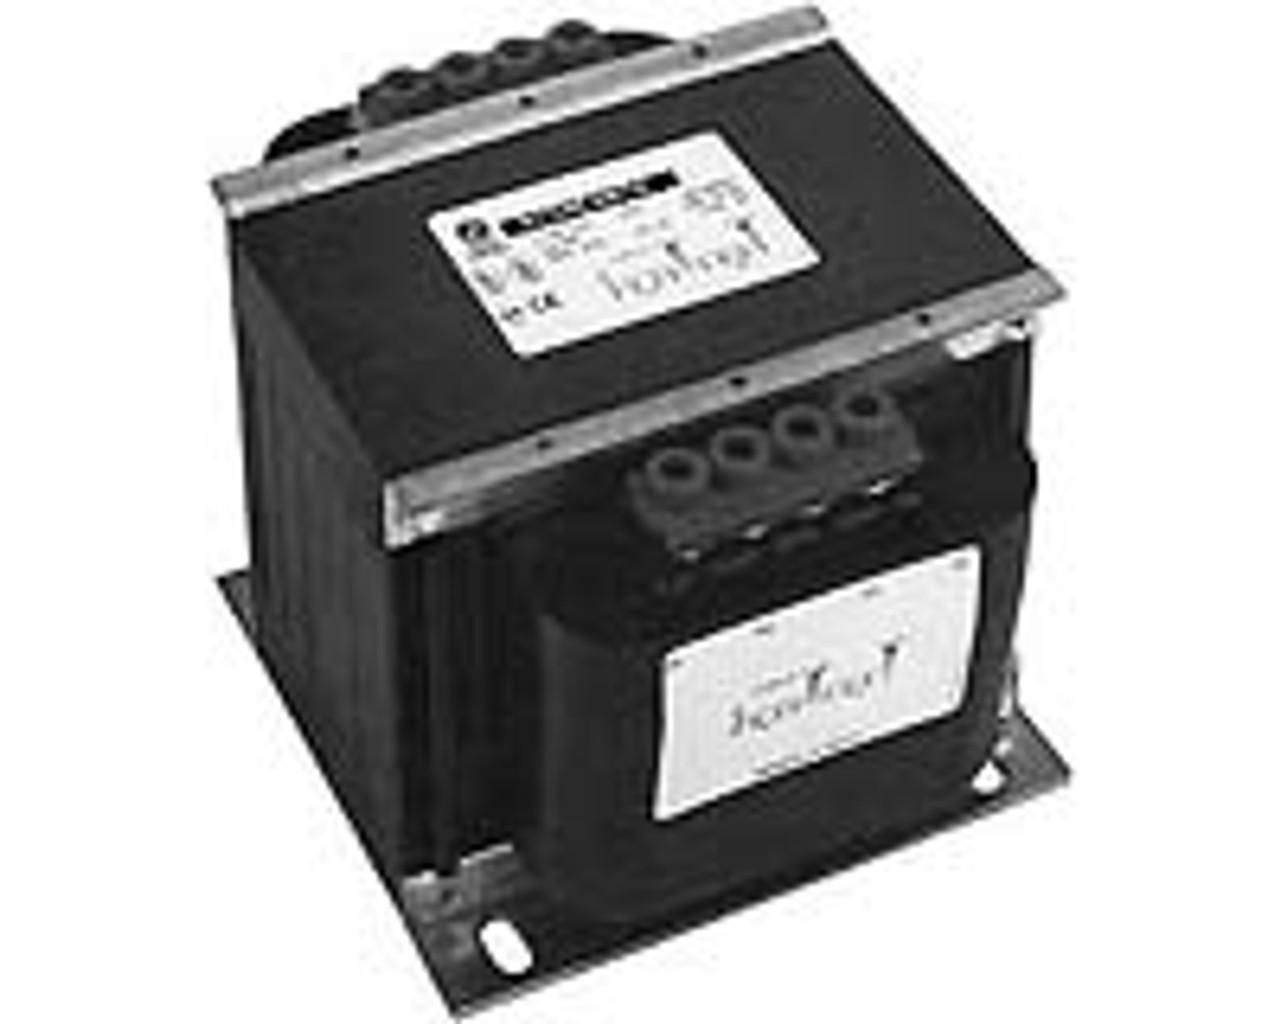 GE 9T58K4132 - 0.1 KVA 240x480 TO 12x24 VOLTS 1PH TRANSFORMER - Newe